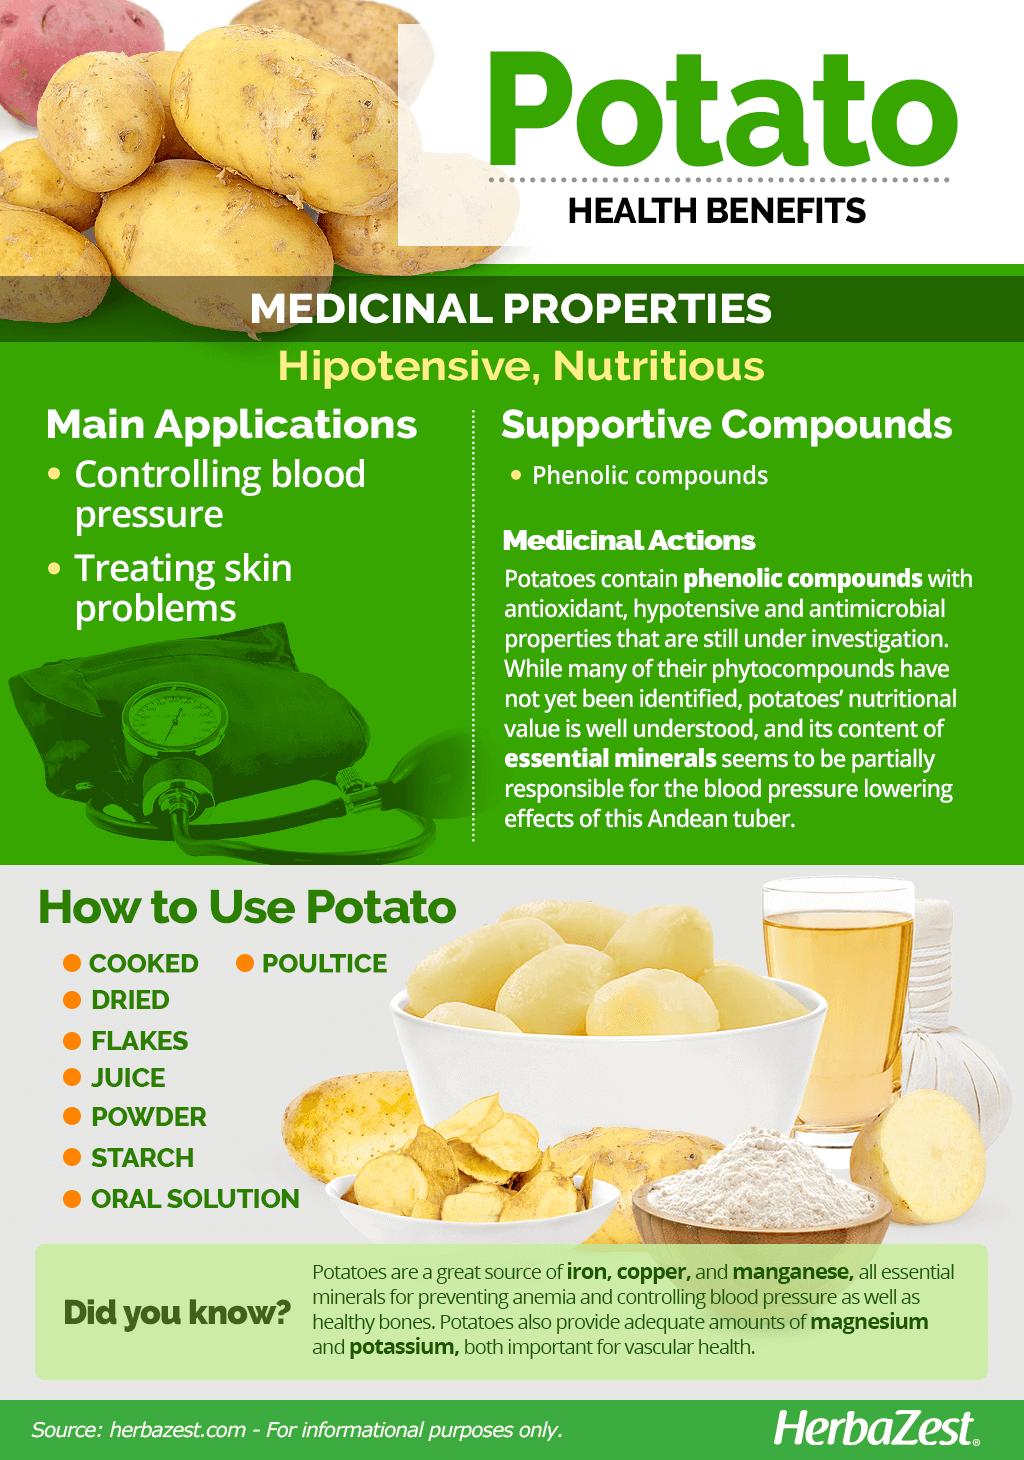 All About Potato